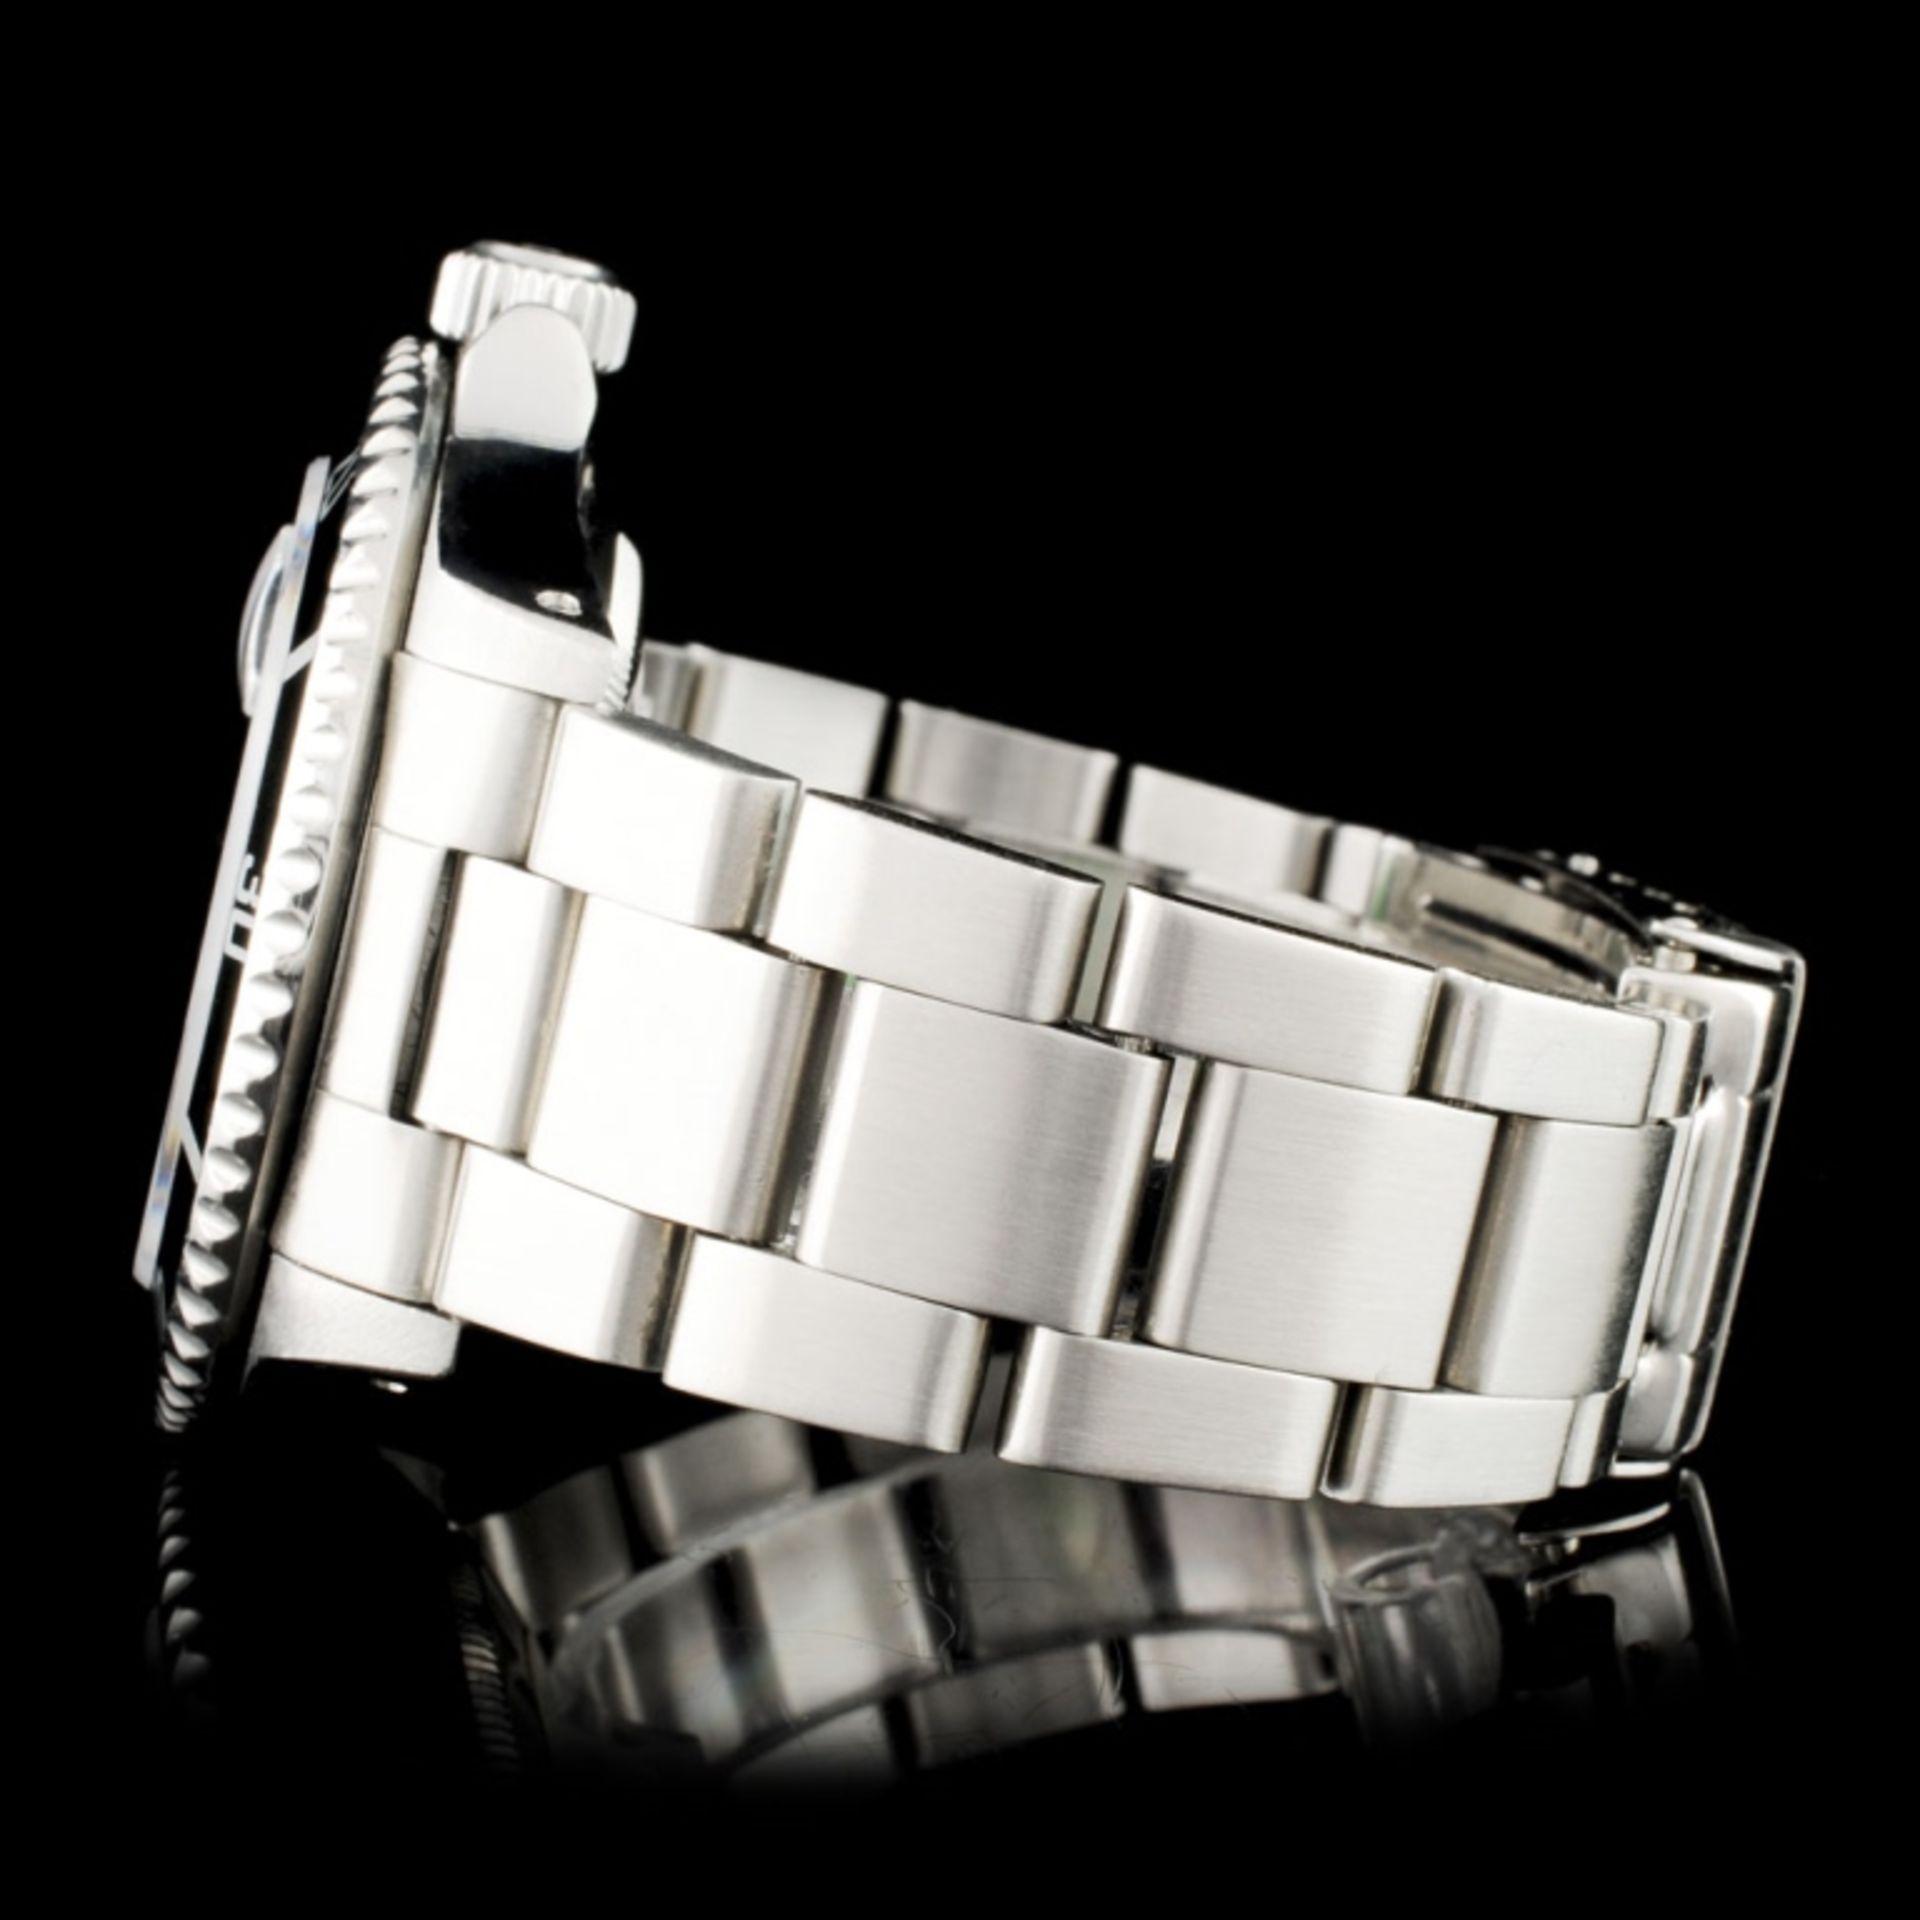 Rolex Submariner SS 40MM Diamond Wristwatch - Image 4 of 7